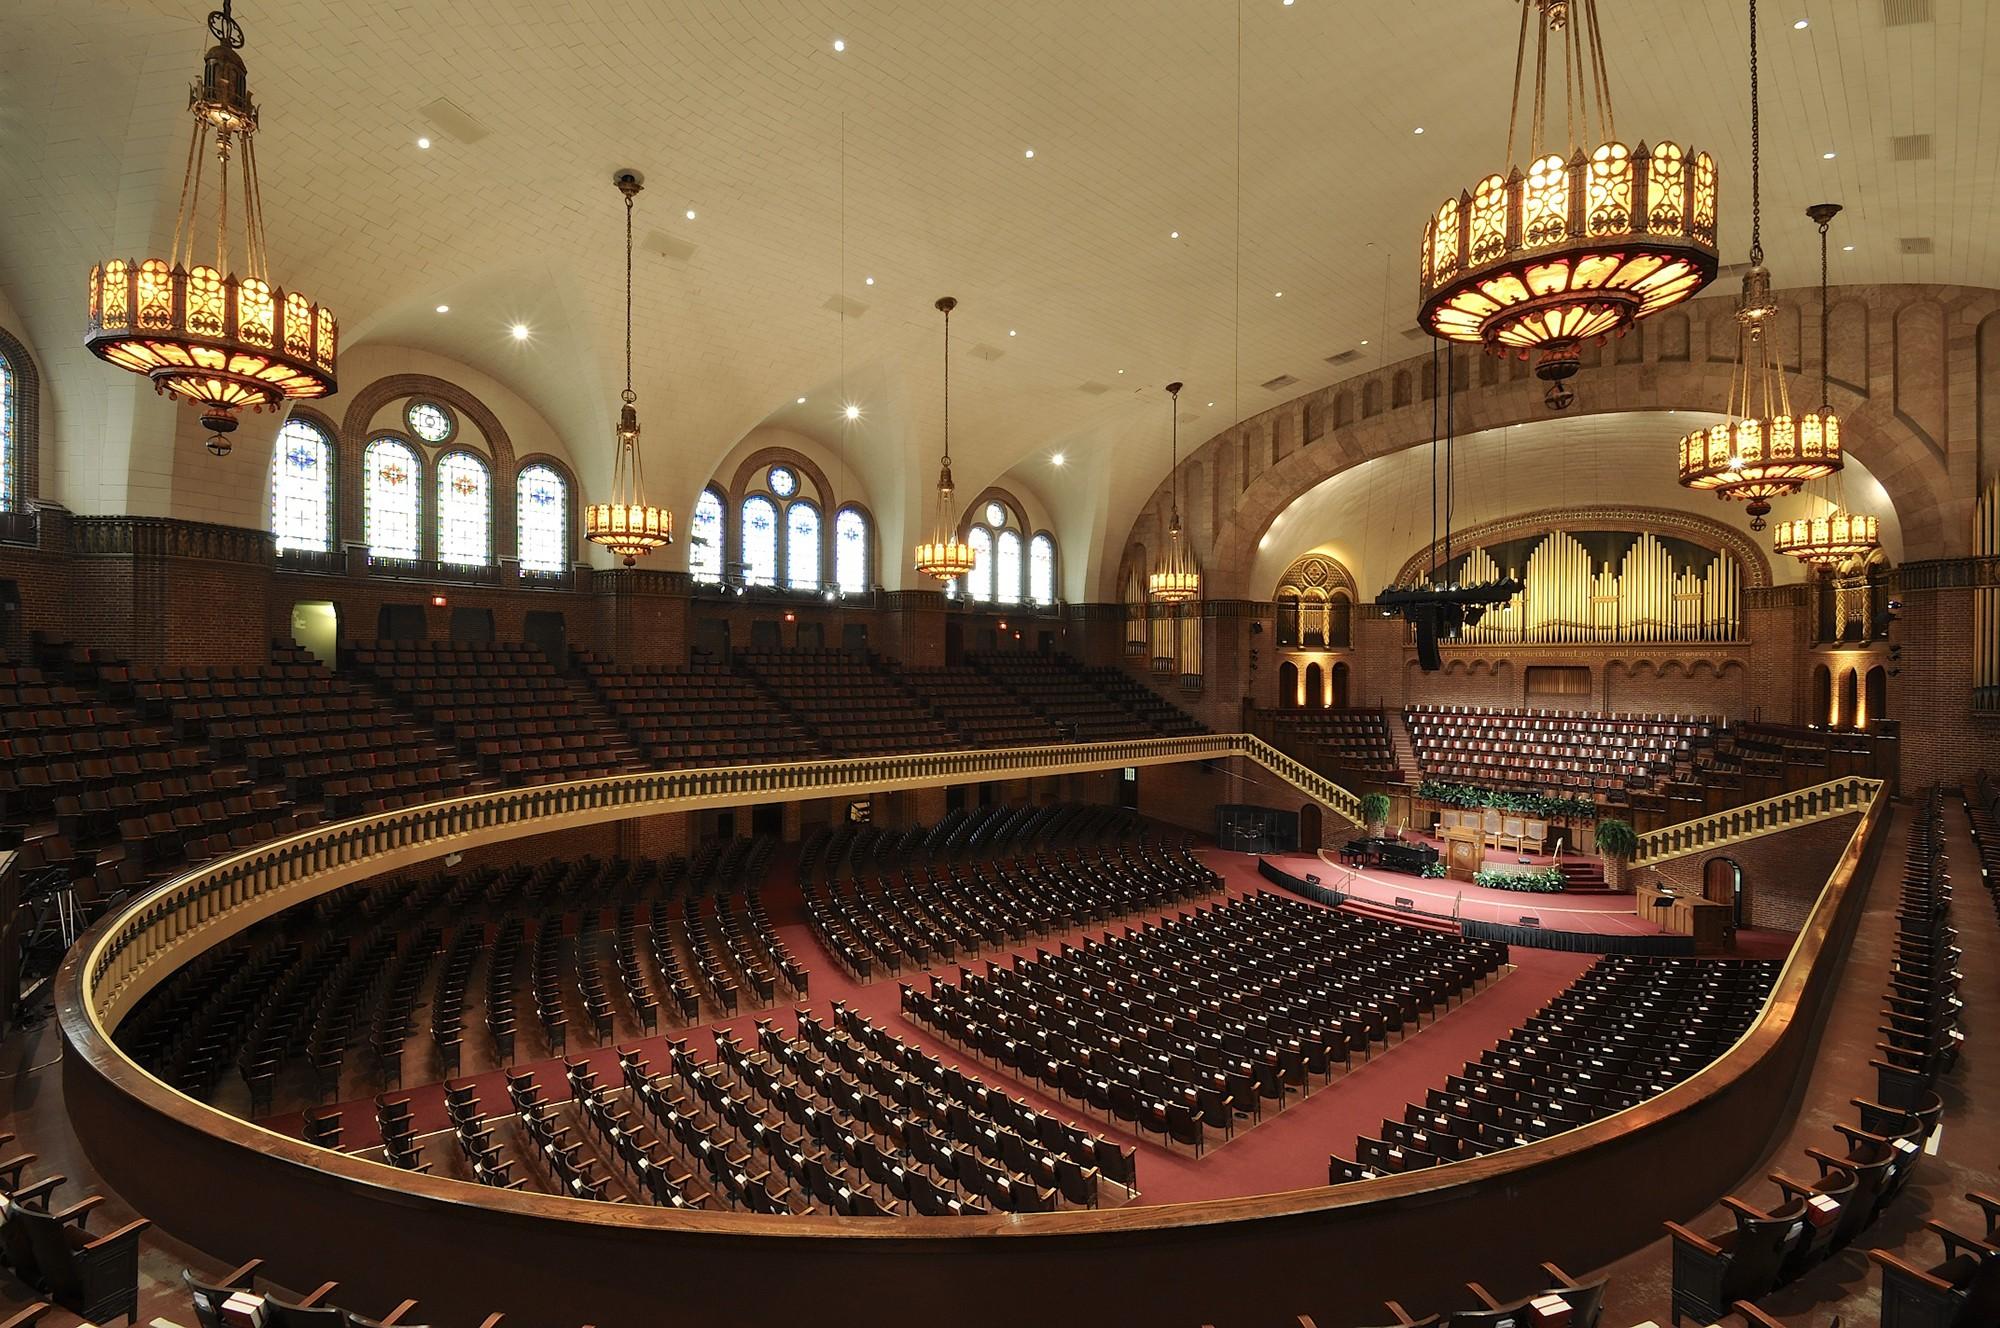 The Moody Church